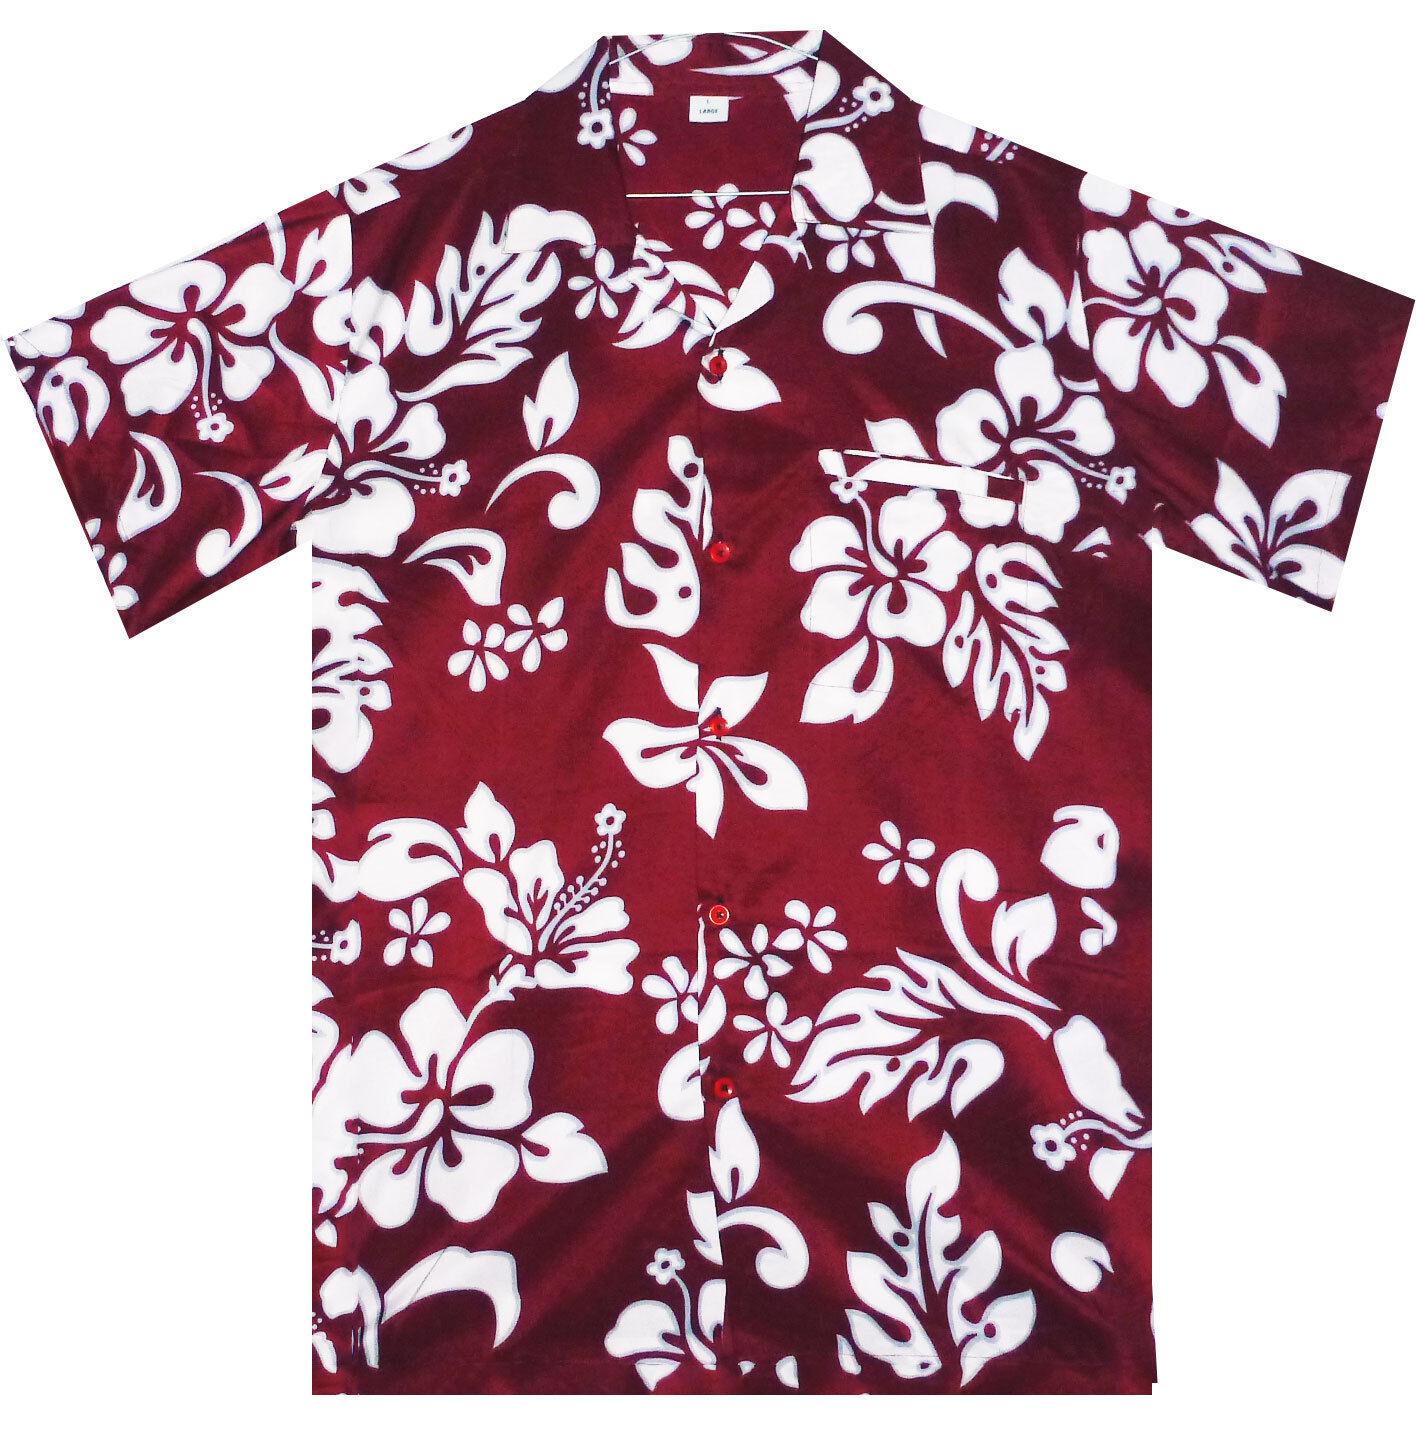 Funky Hawaiihemd Hibiscus Maroon Rot B Ware